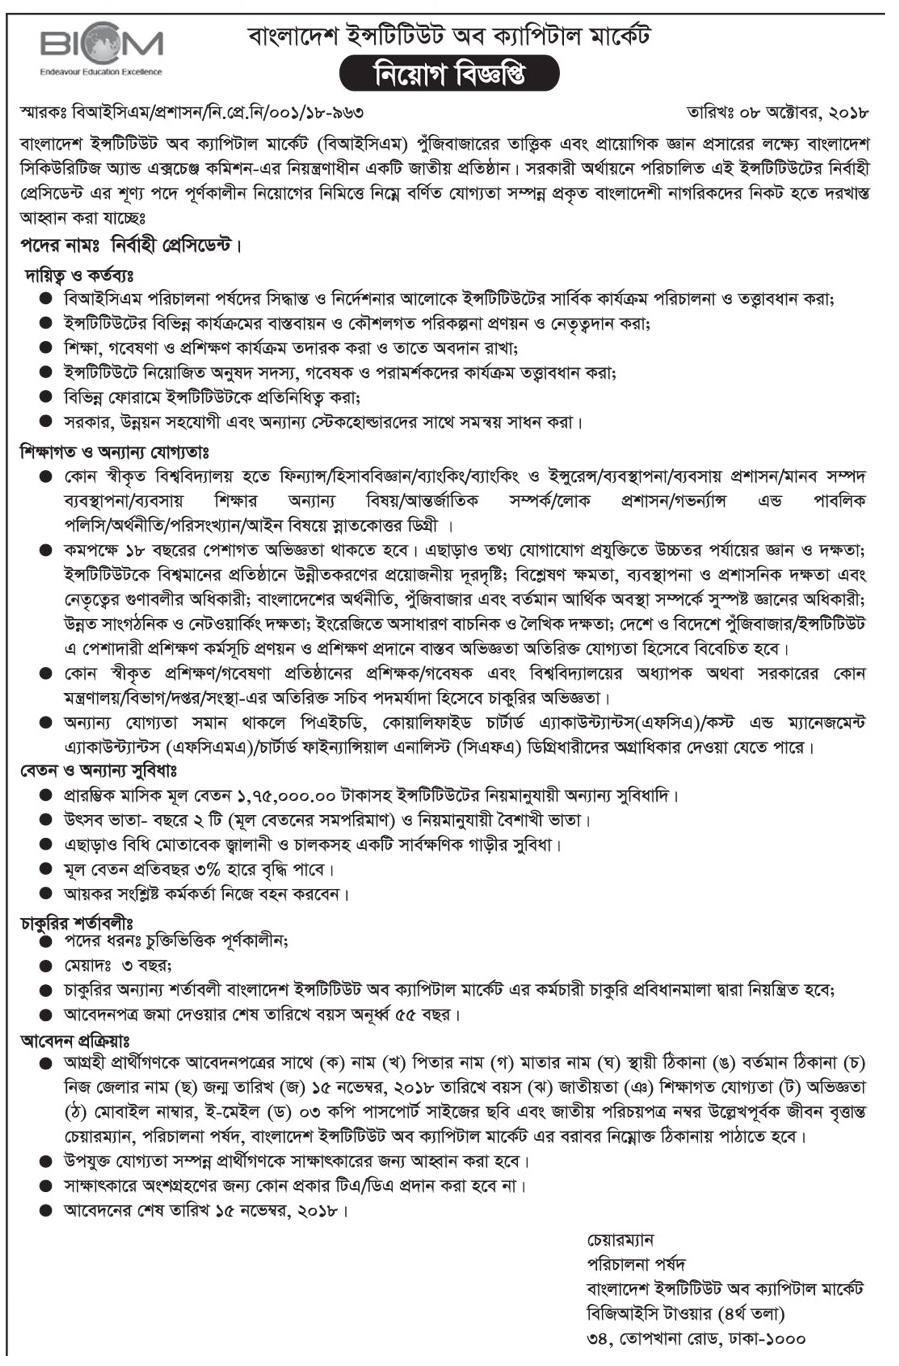 Bangladesh Securities & Exchange Commission SEC Job Circular 2018